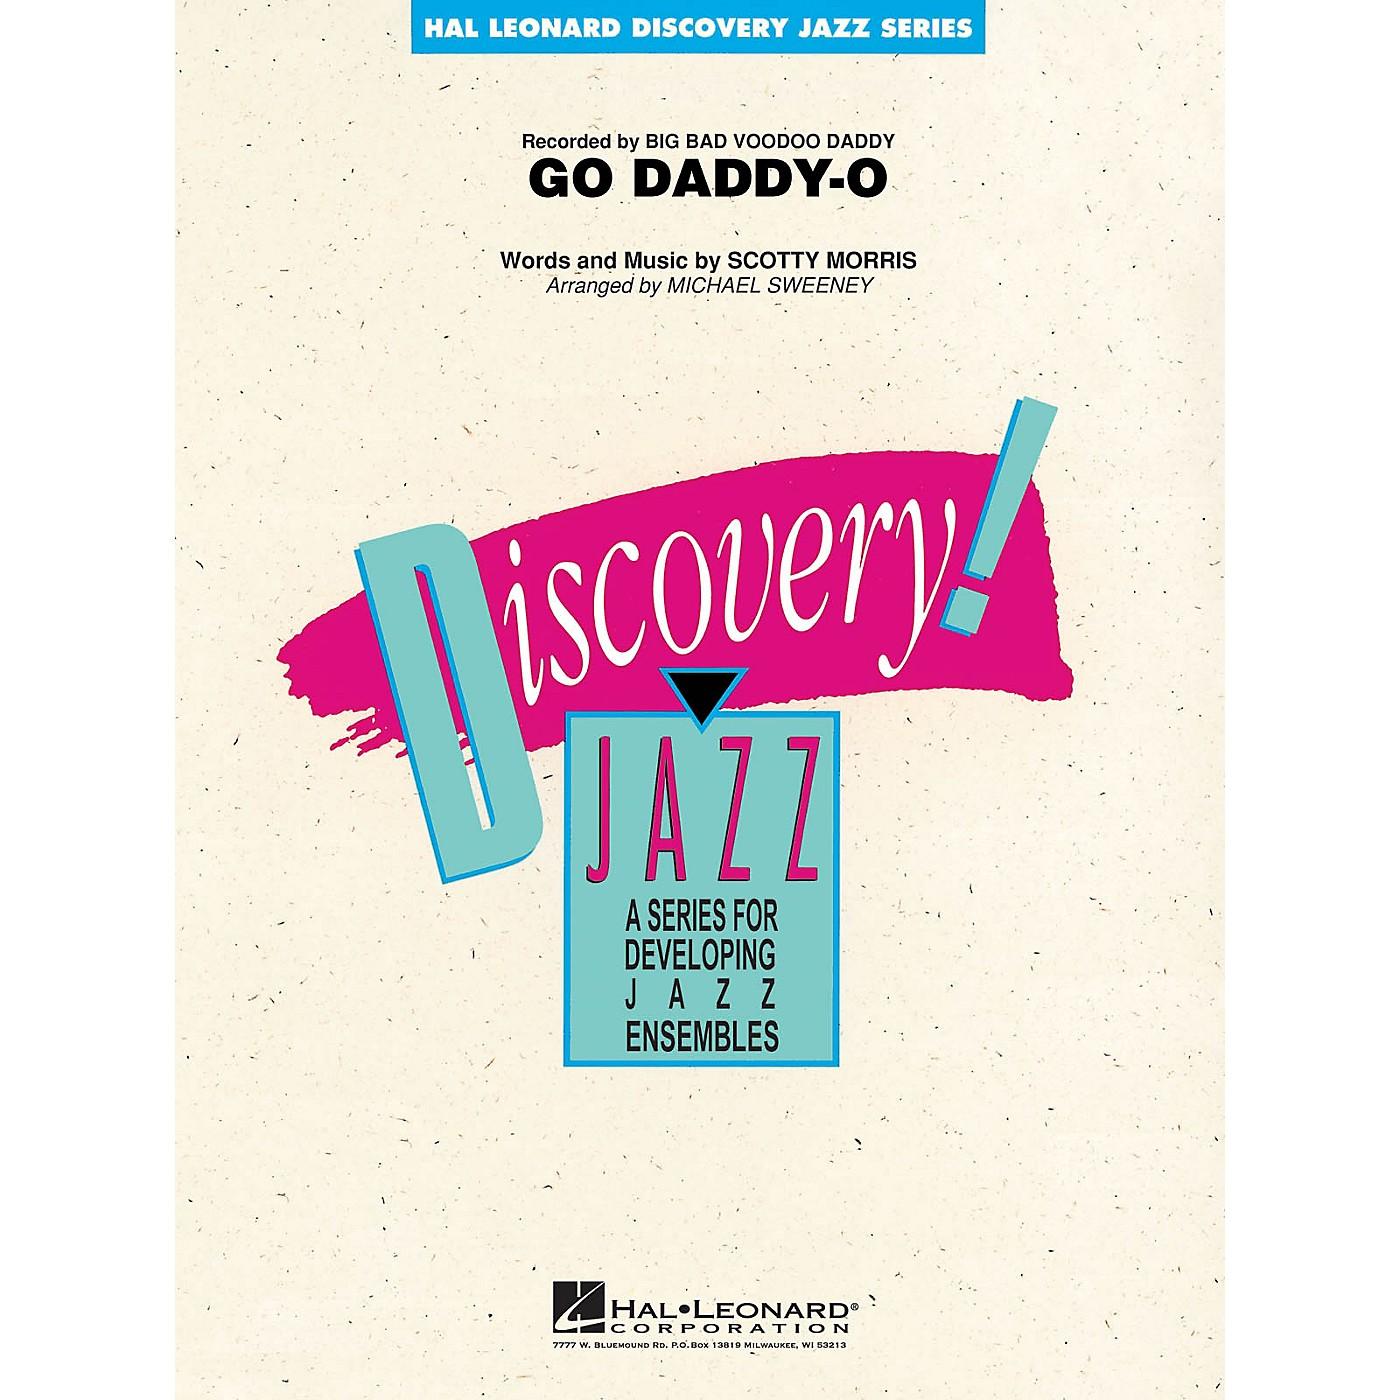 Hal Leonard Go Daddy-O Jazz Band Level 1-2 Arranged by Michael Sweeney thumbnail